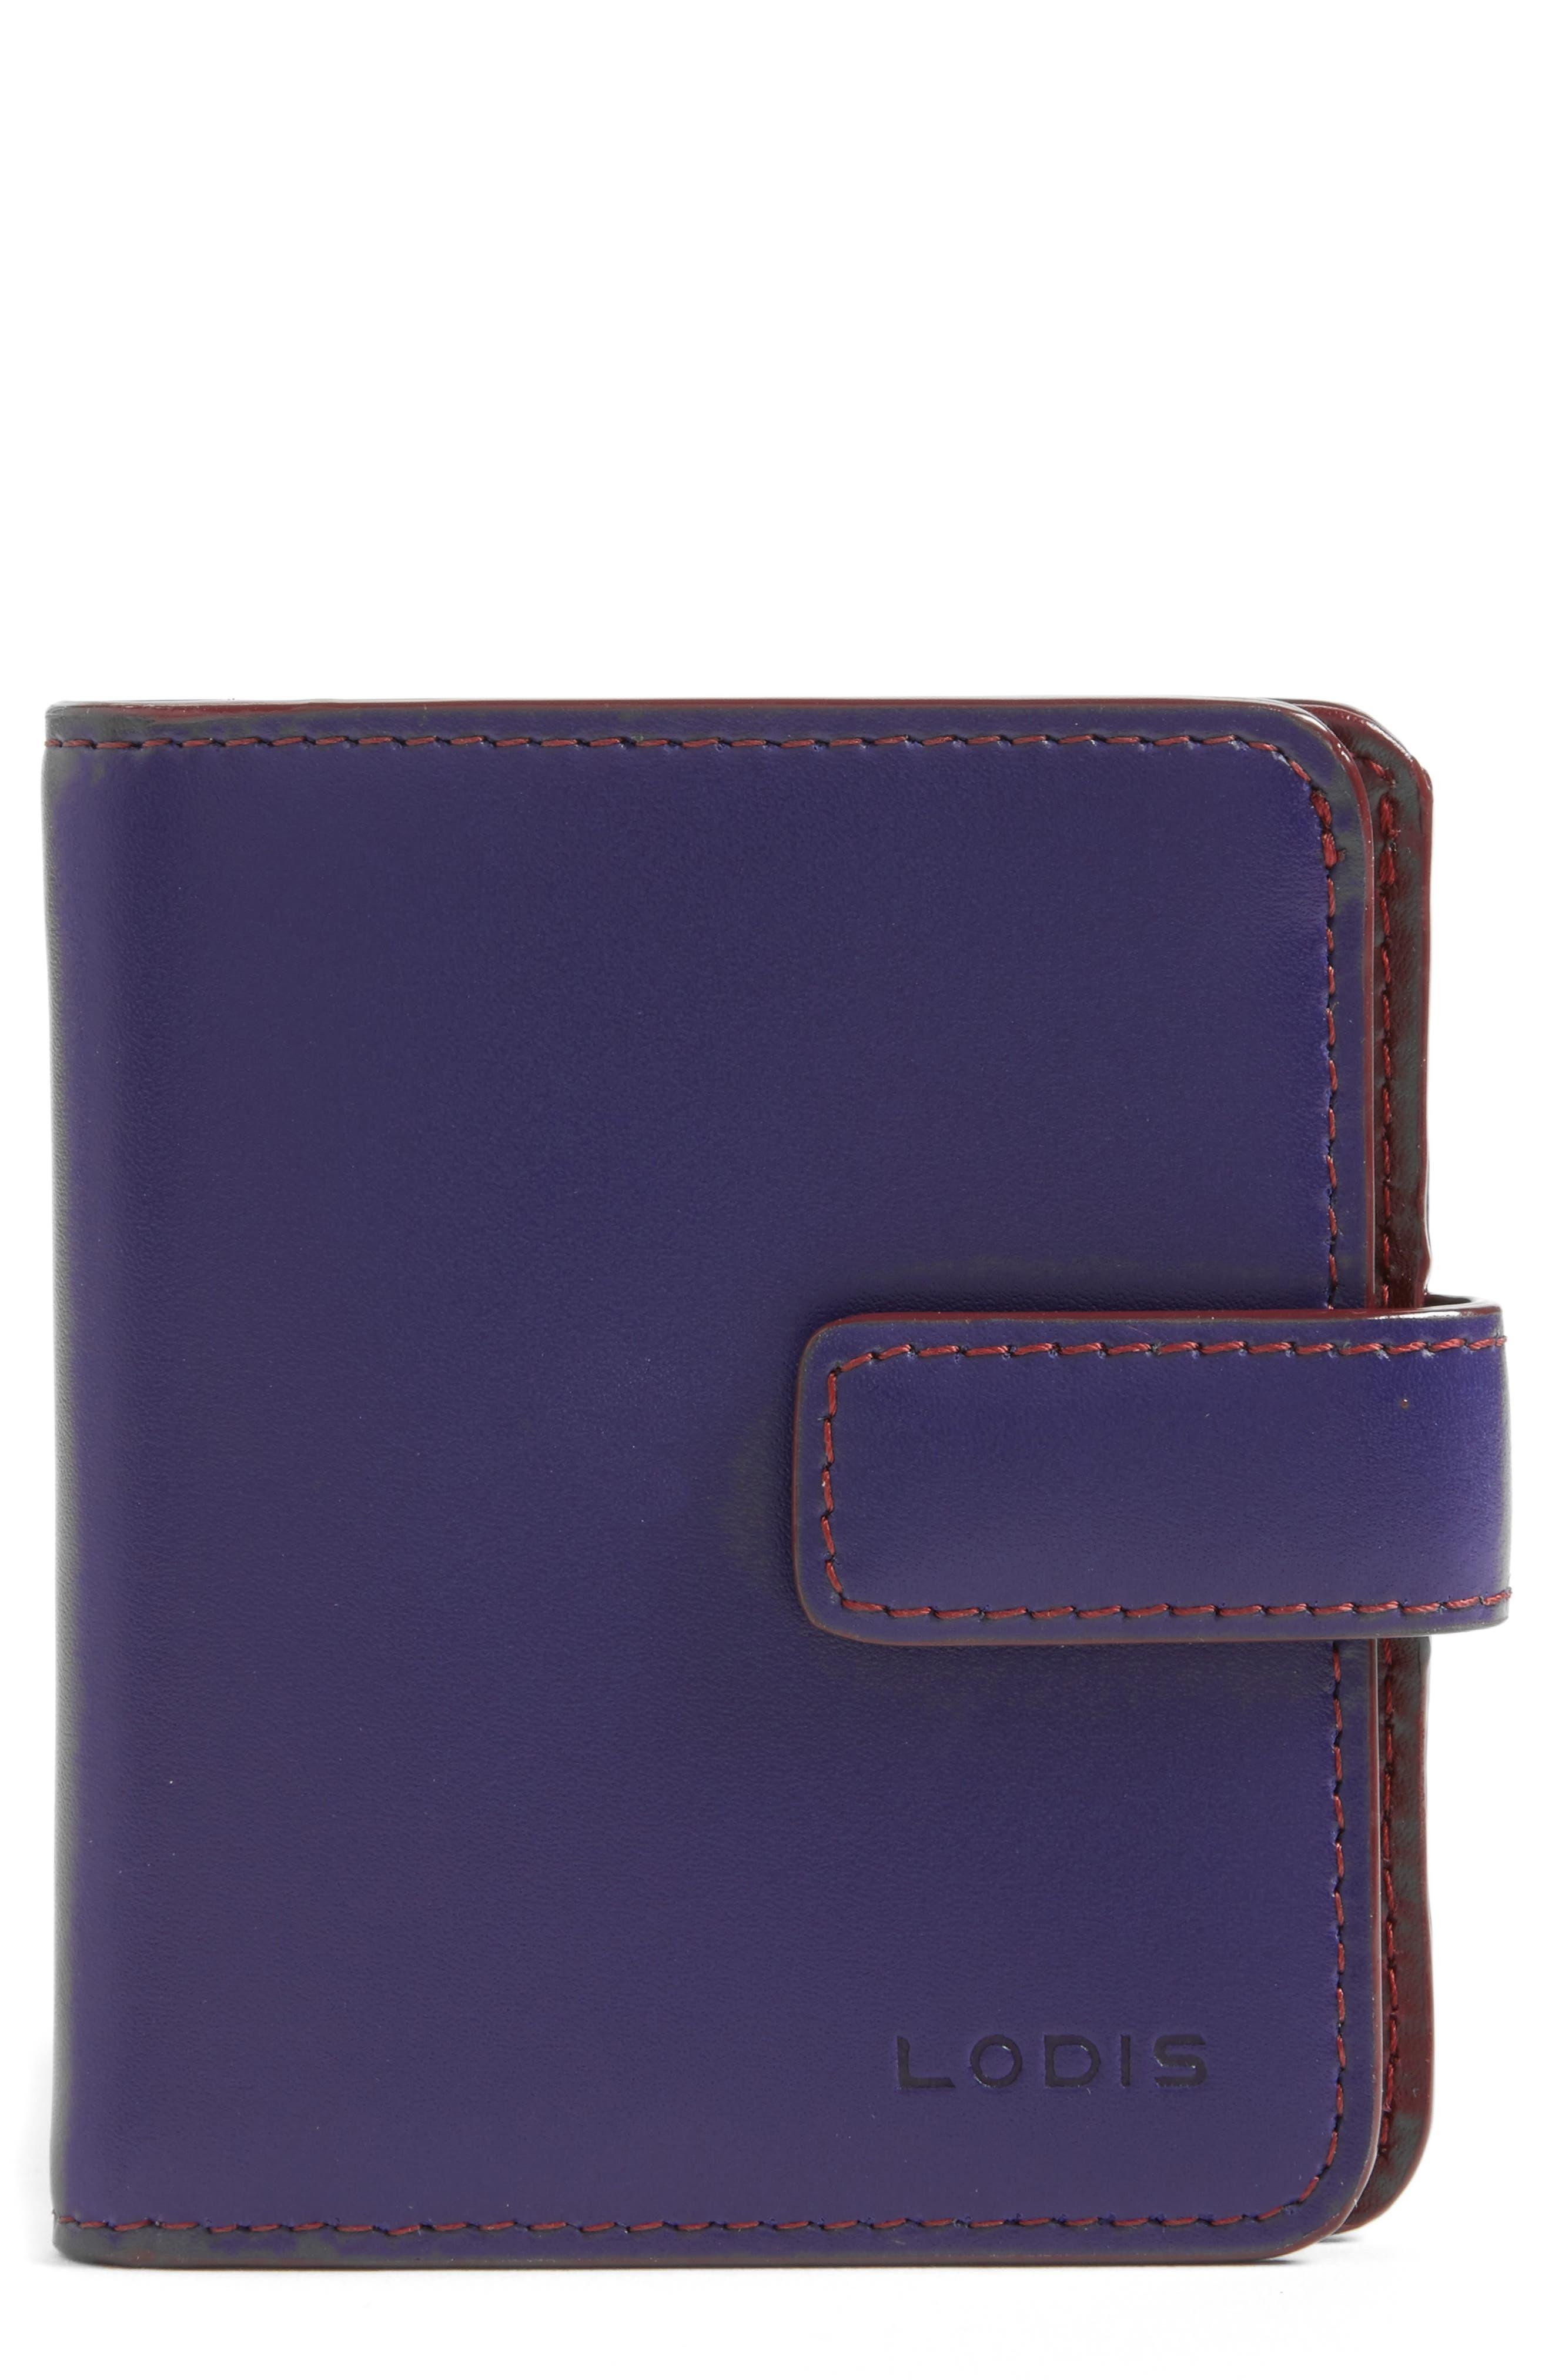 Lodis Petite Audrey RFID Leather Wallet,                             Main thumbnail 2, color,